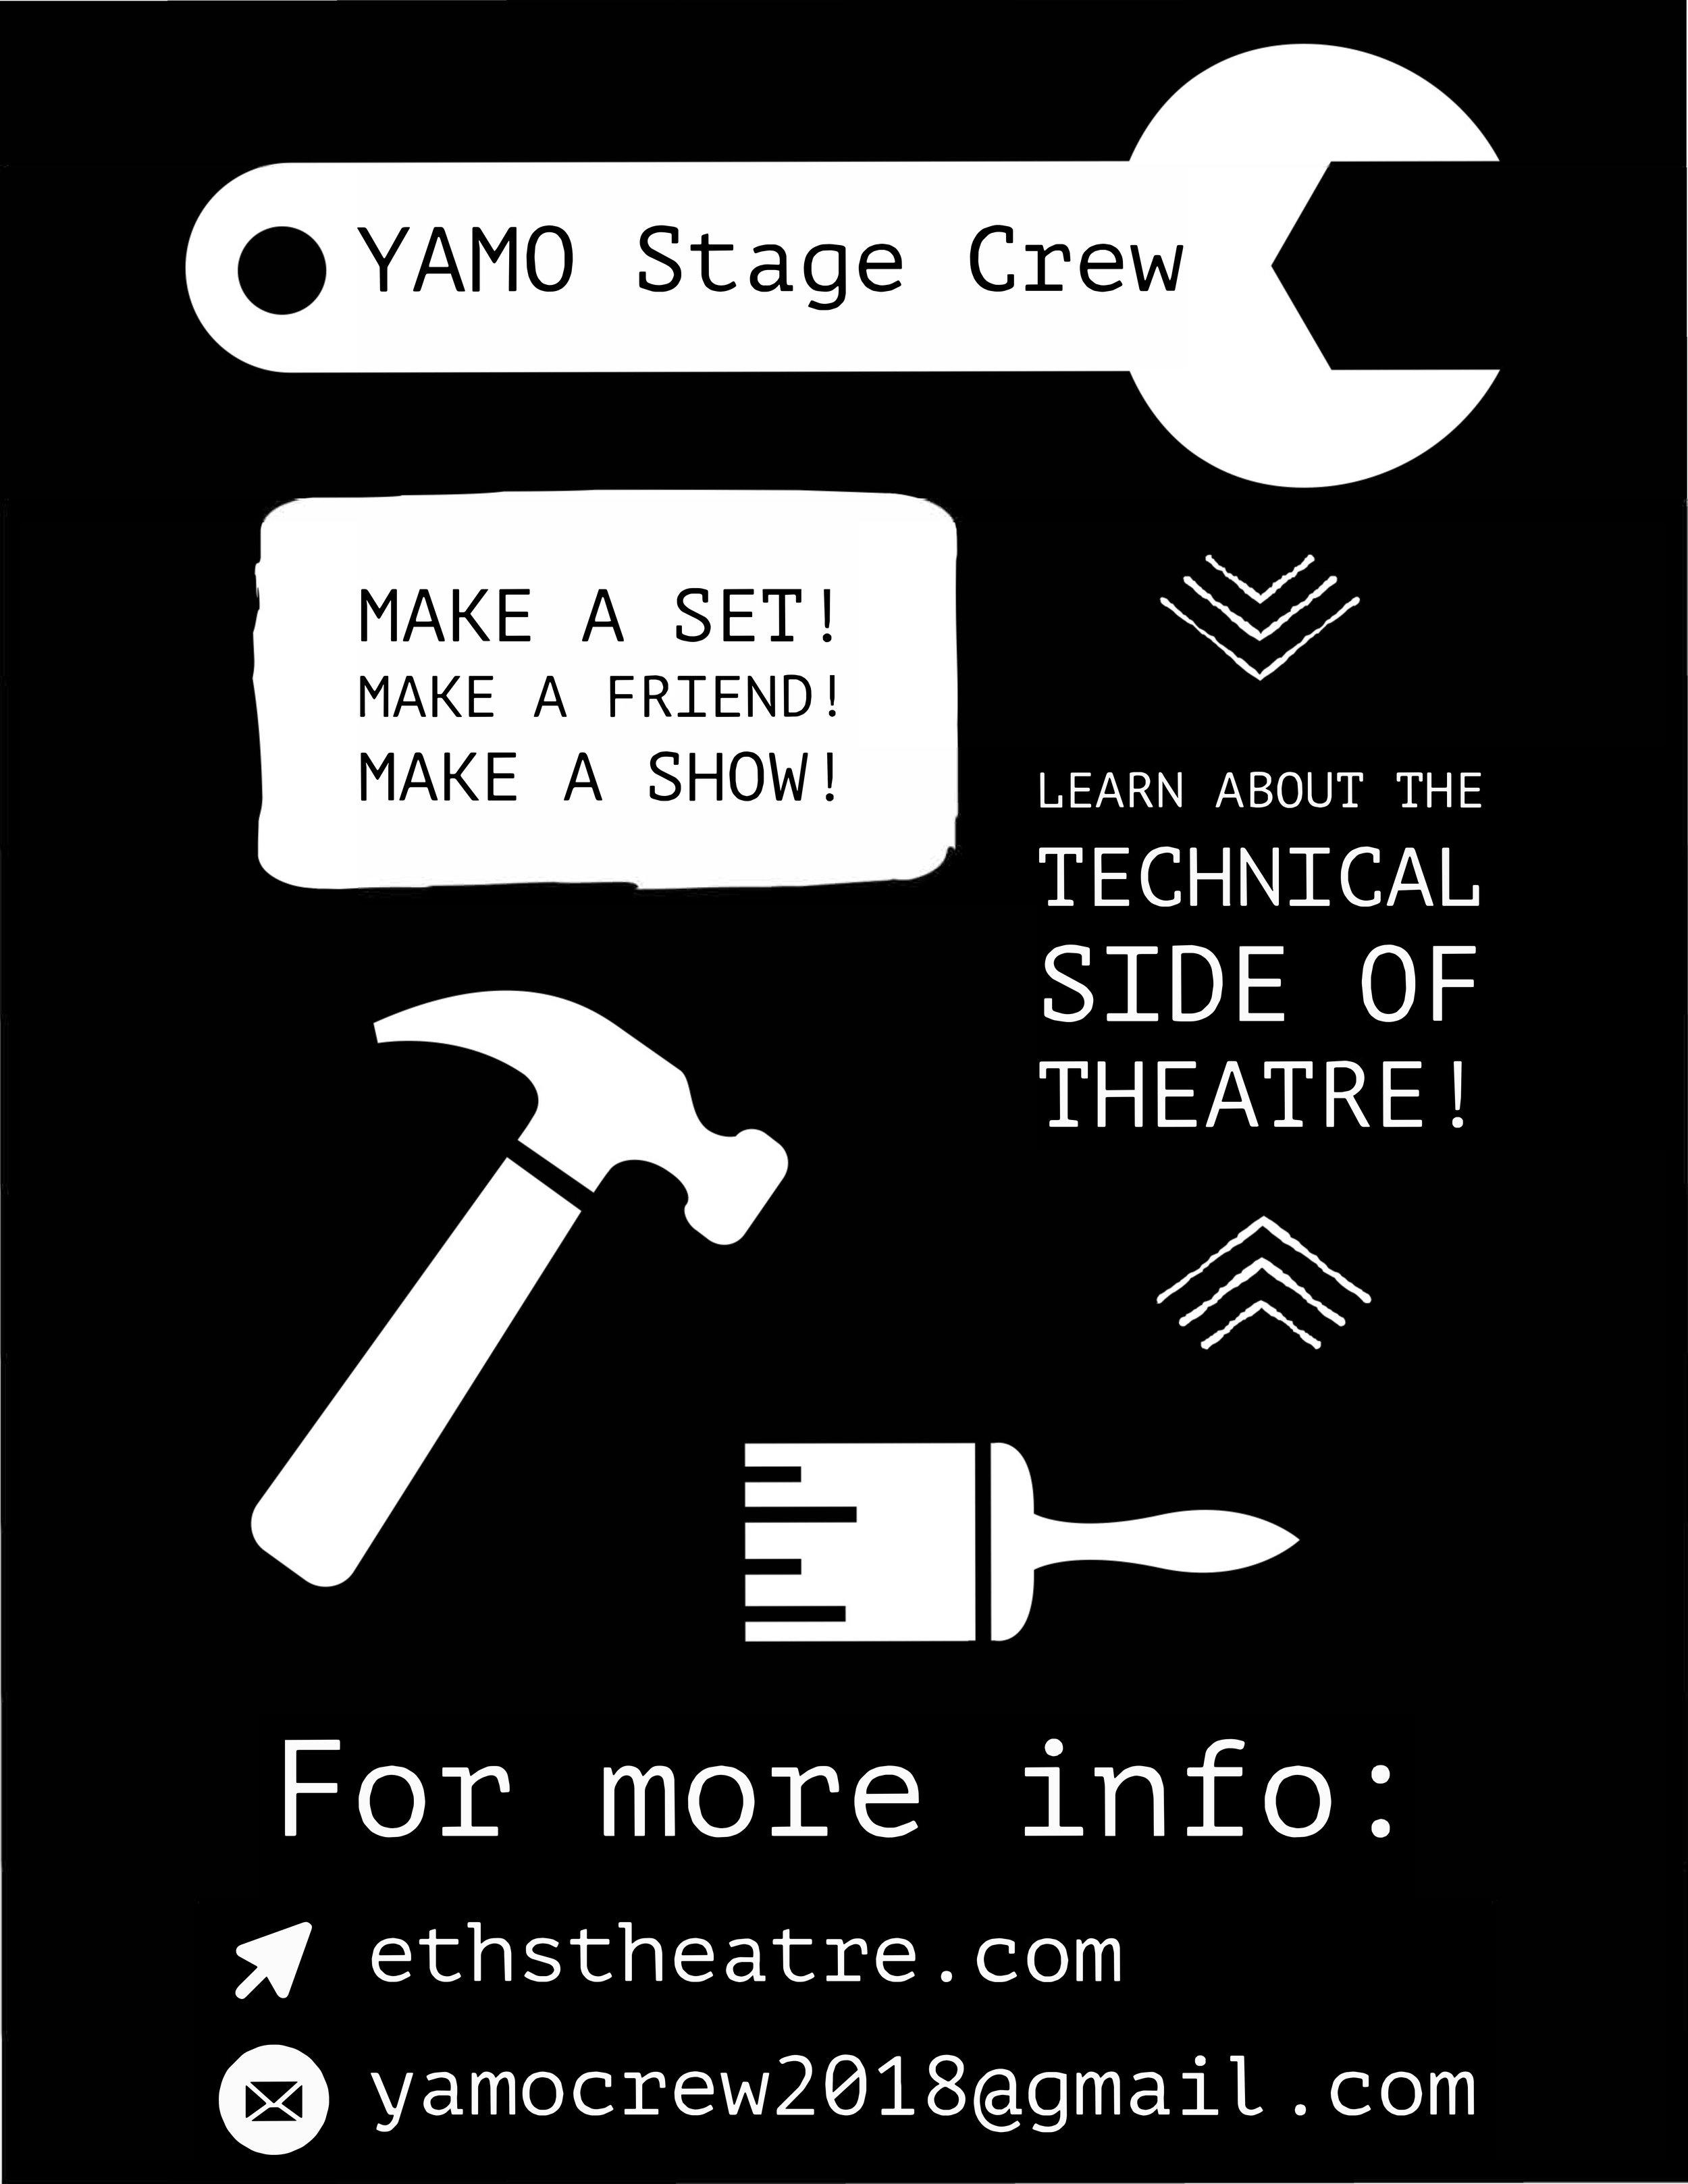 YAMO Crew Poster.jpg